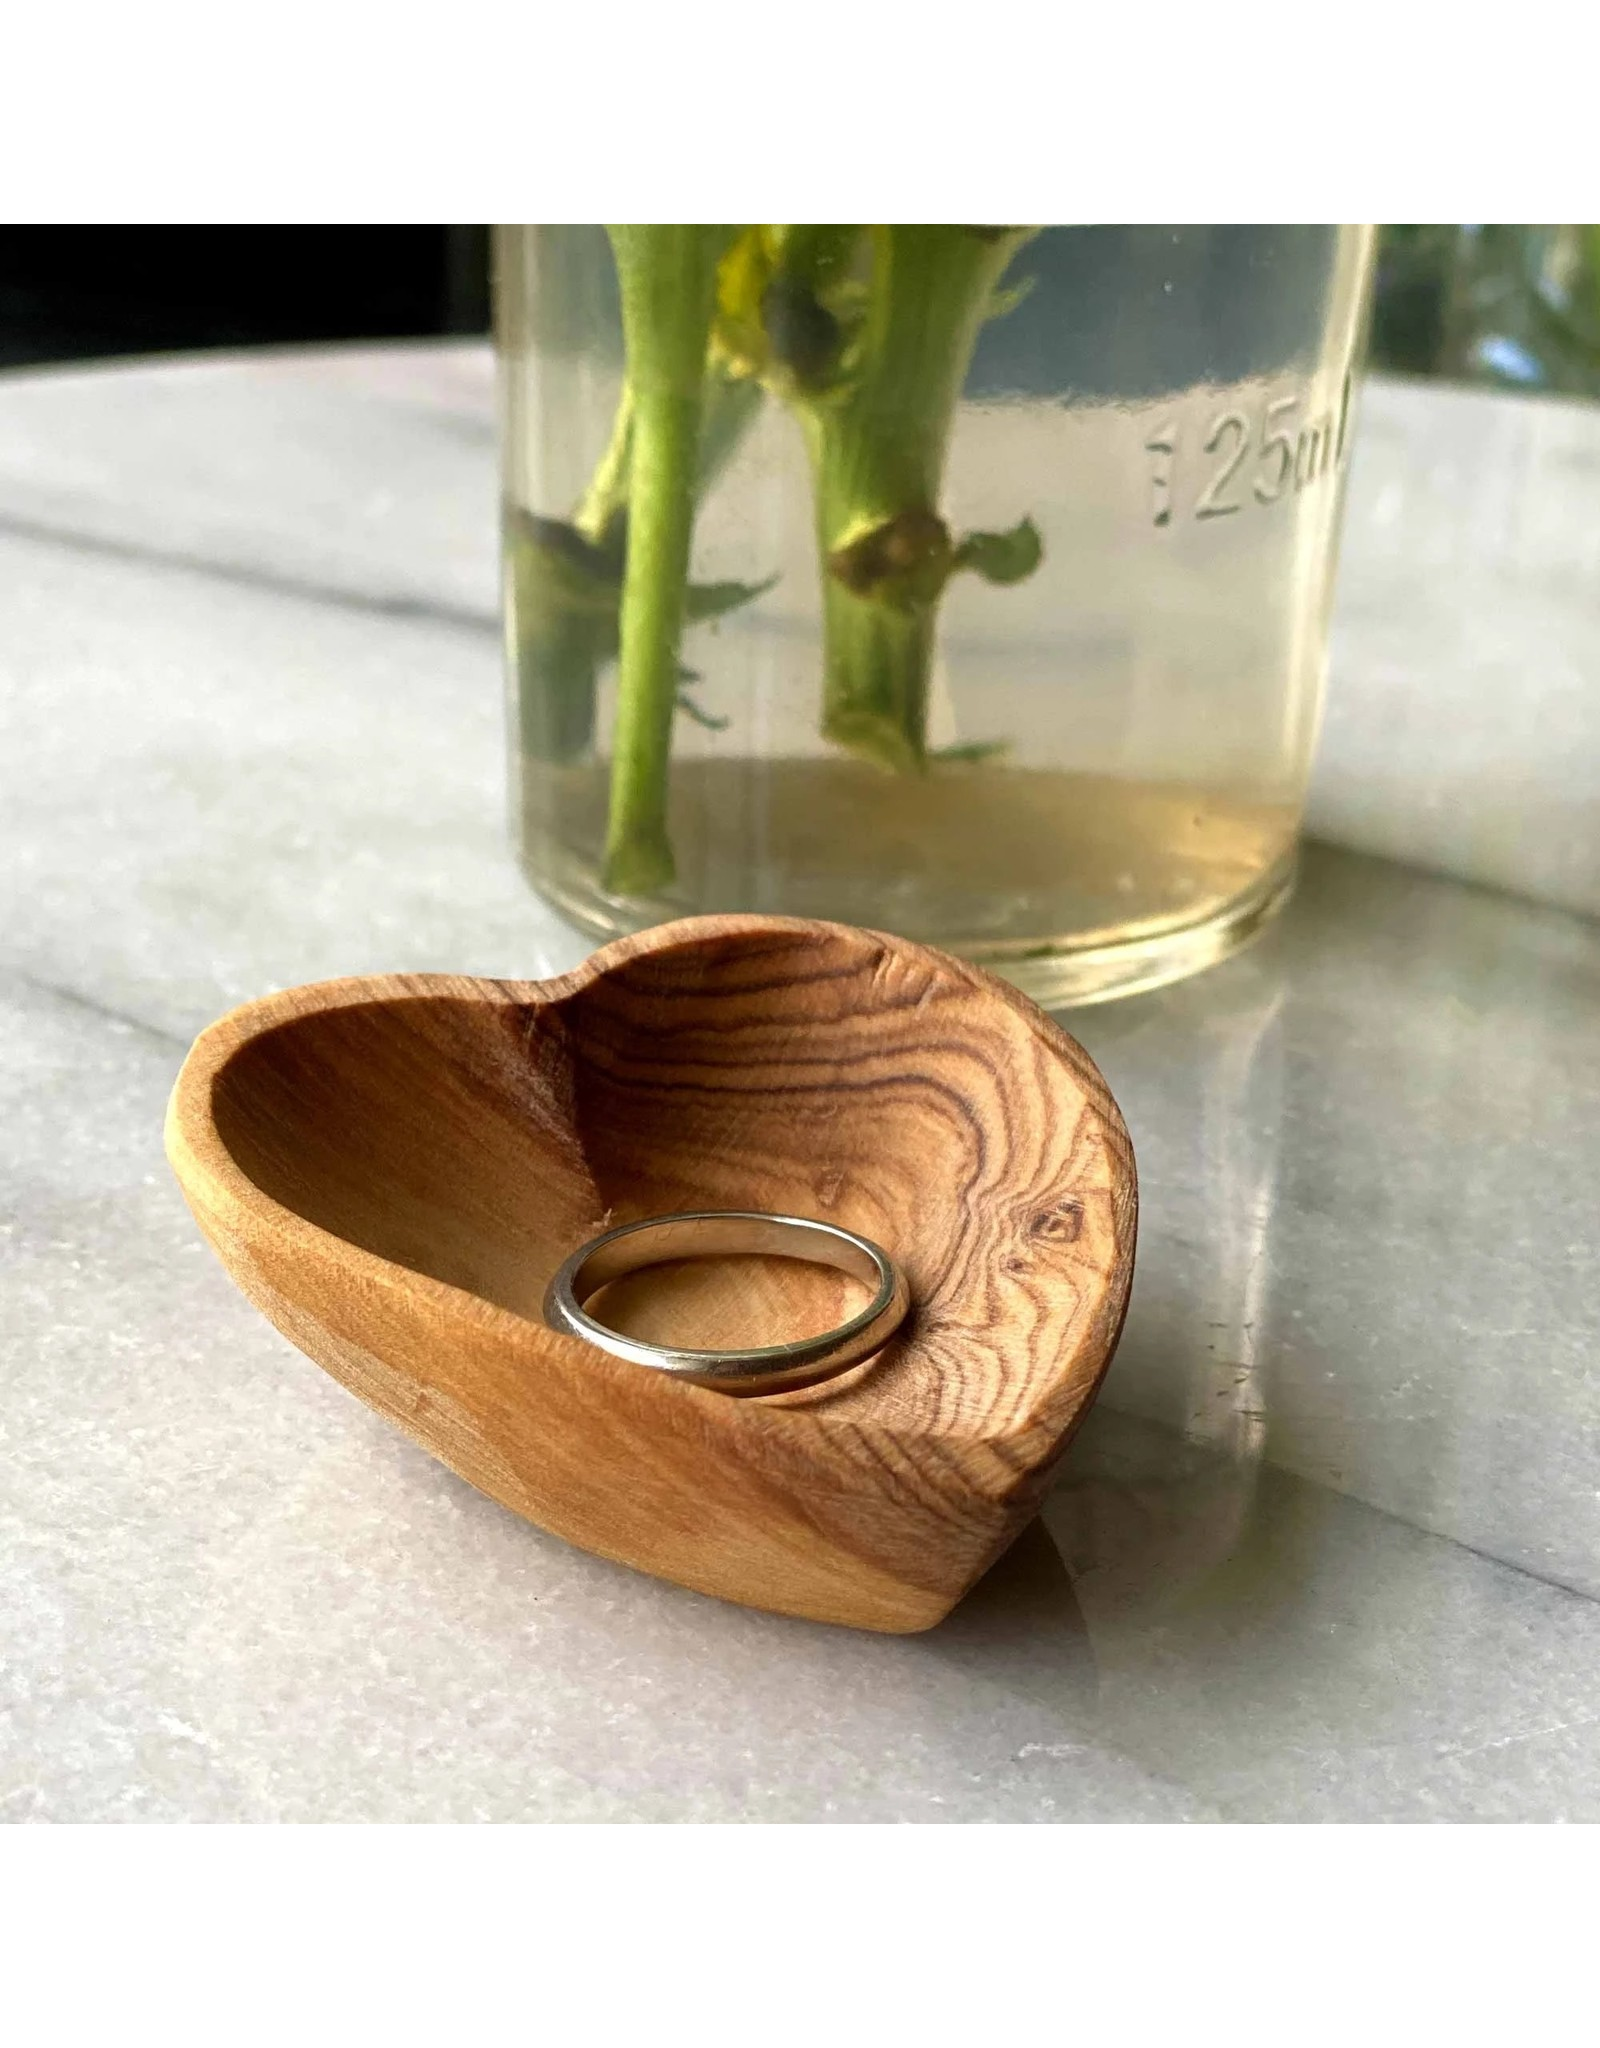 Global Crafts Petite Olivewood Heart Bowl, Kenya